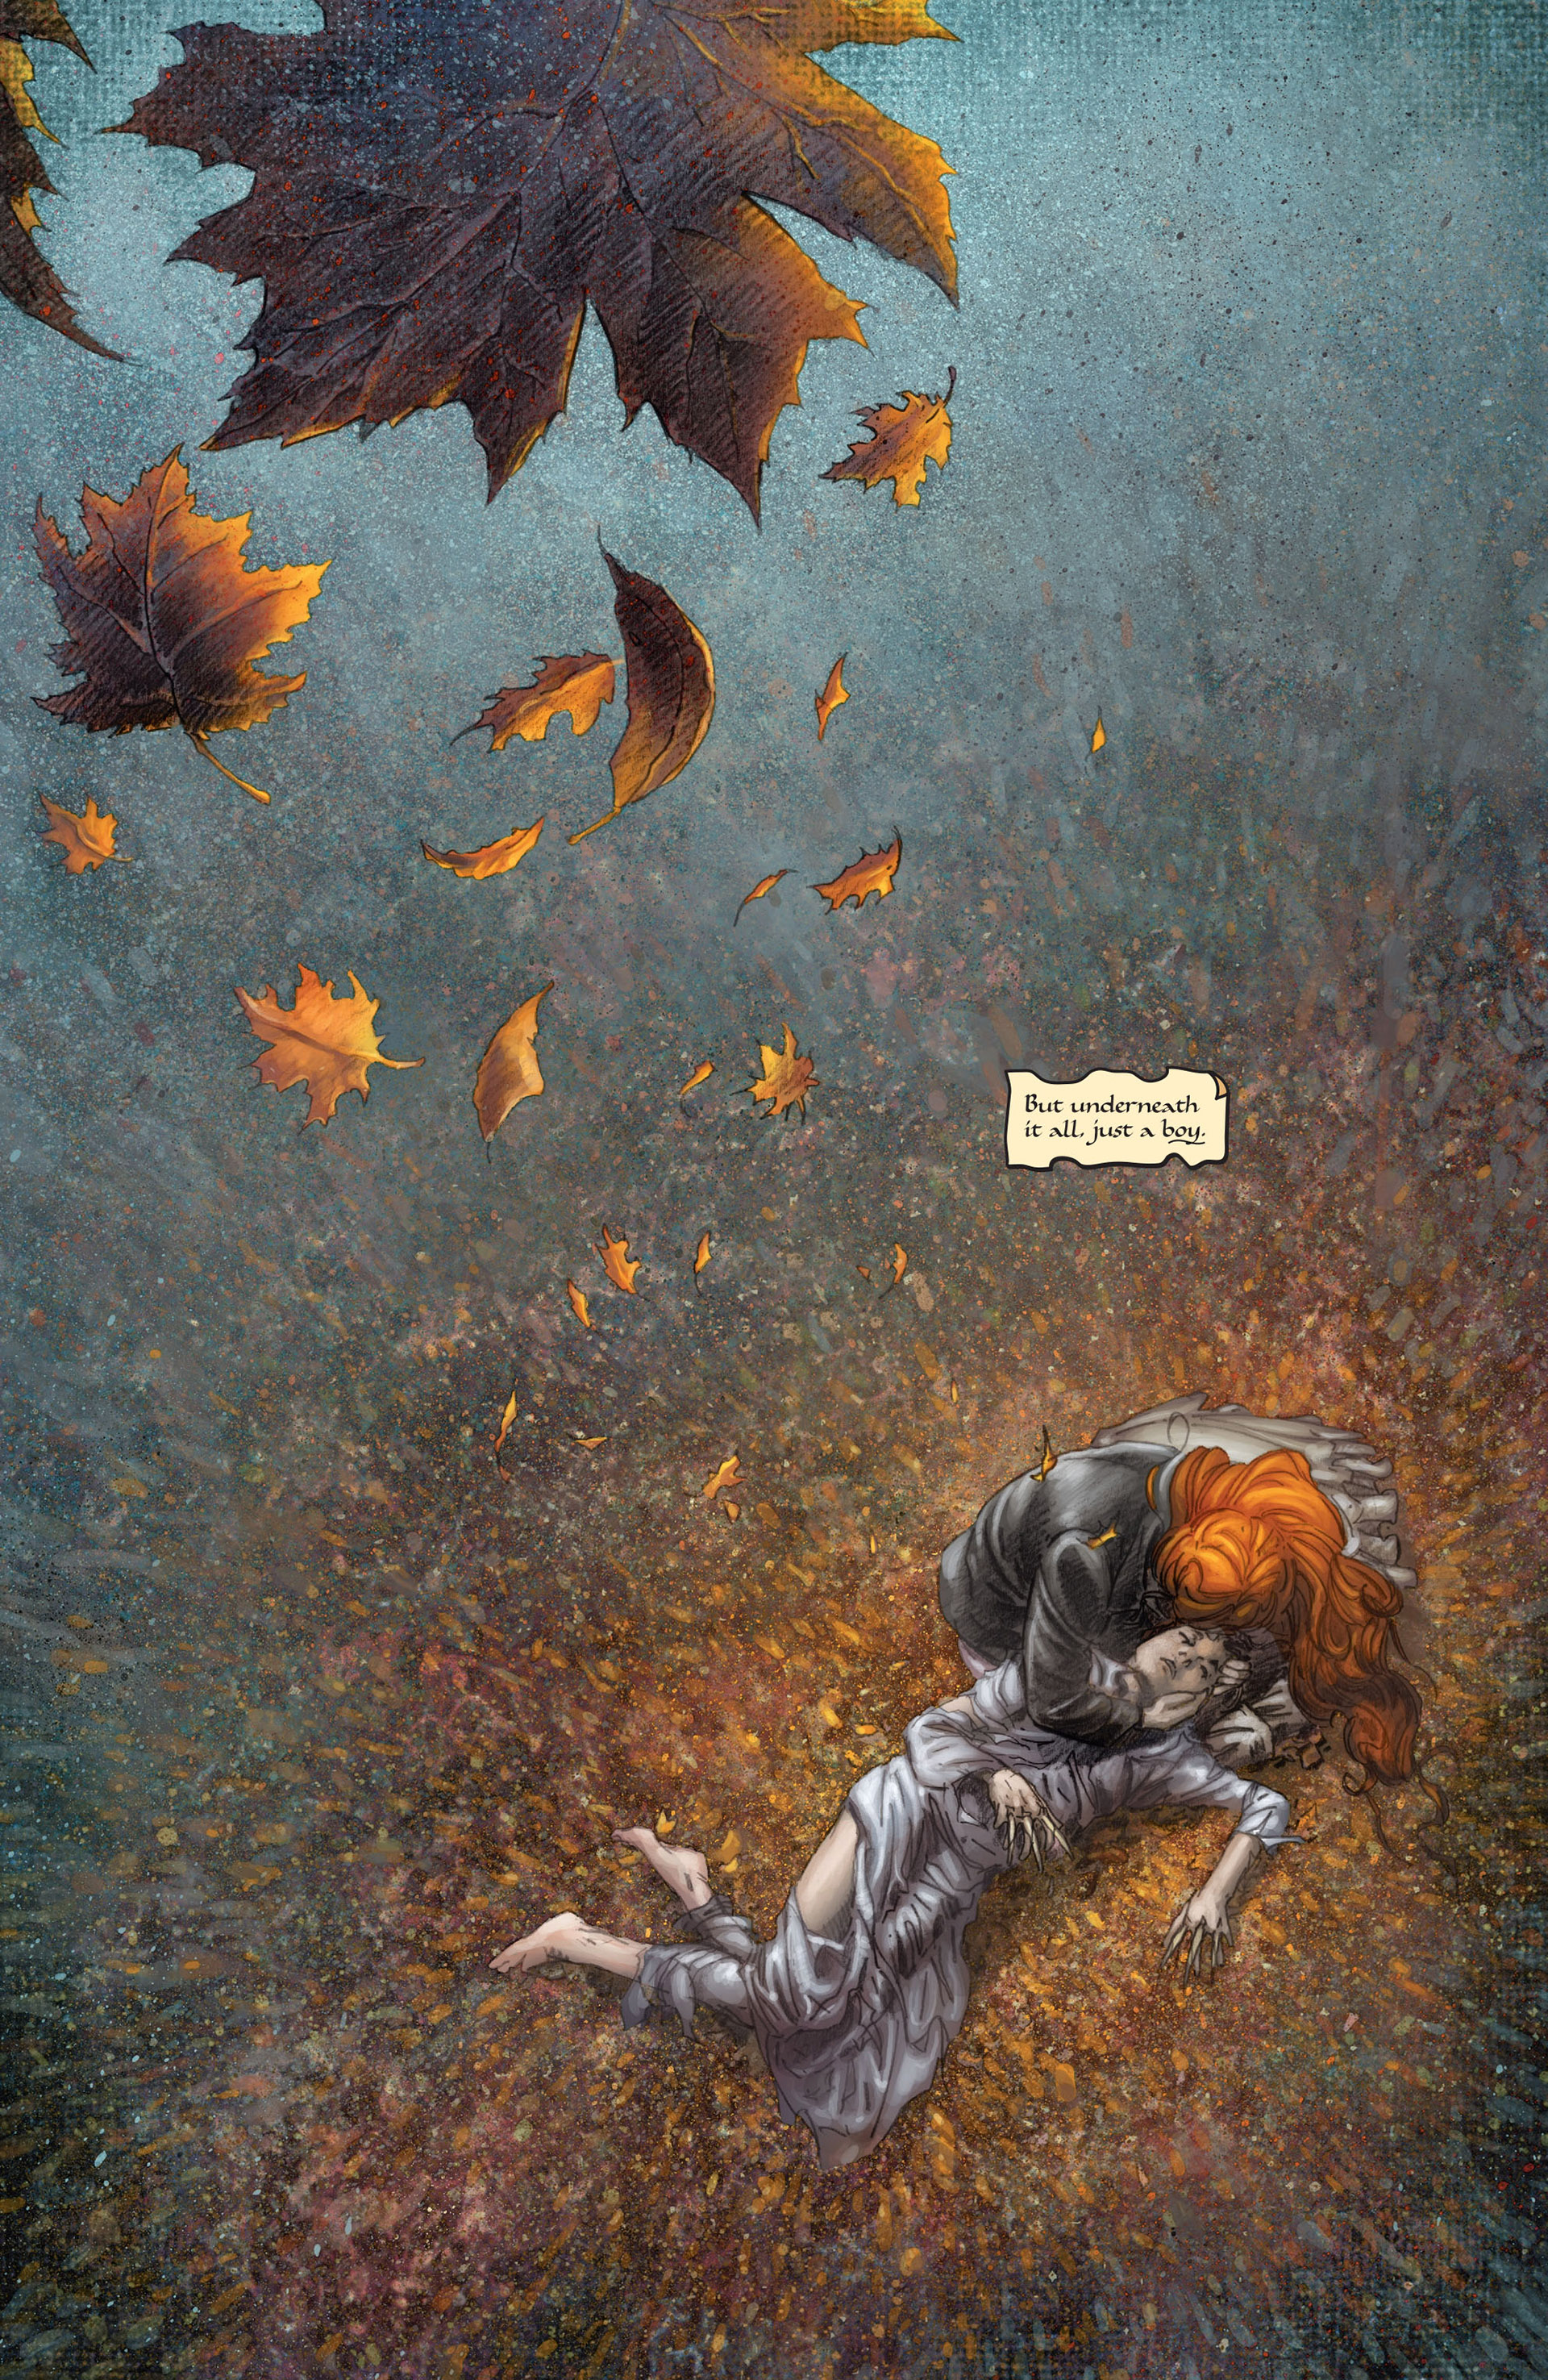 Read online Wolverine: The Origin comic -  Issue #3 - 10